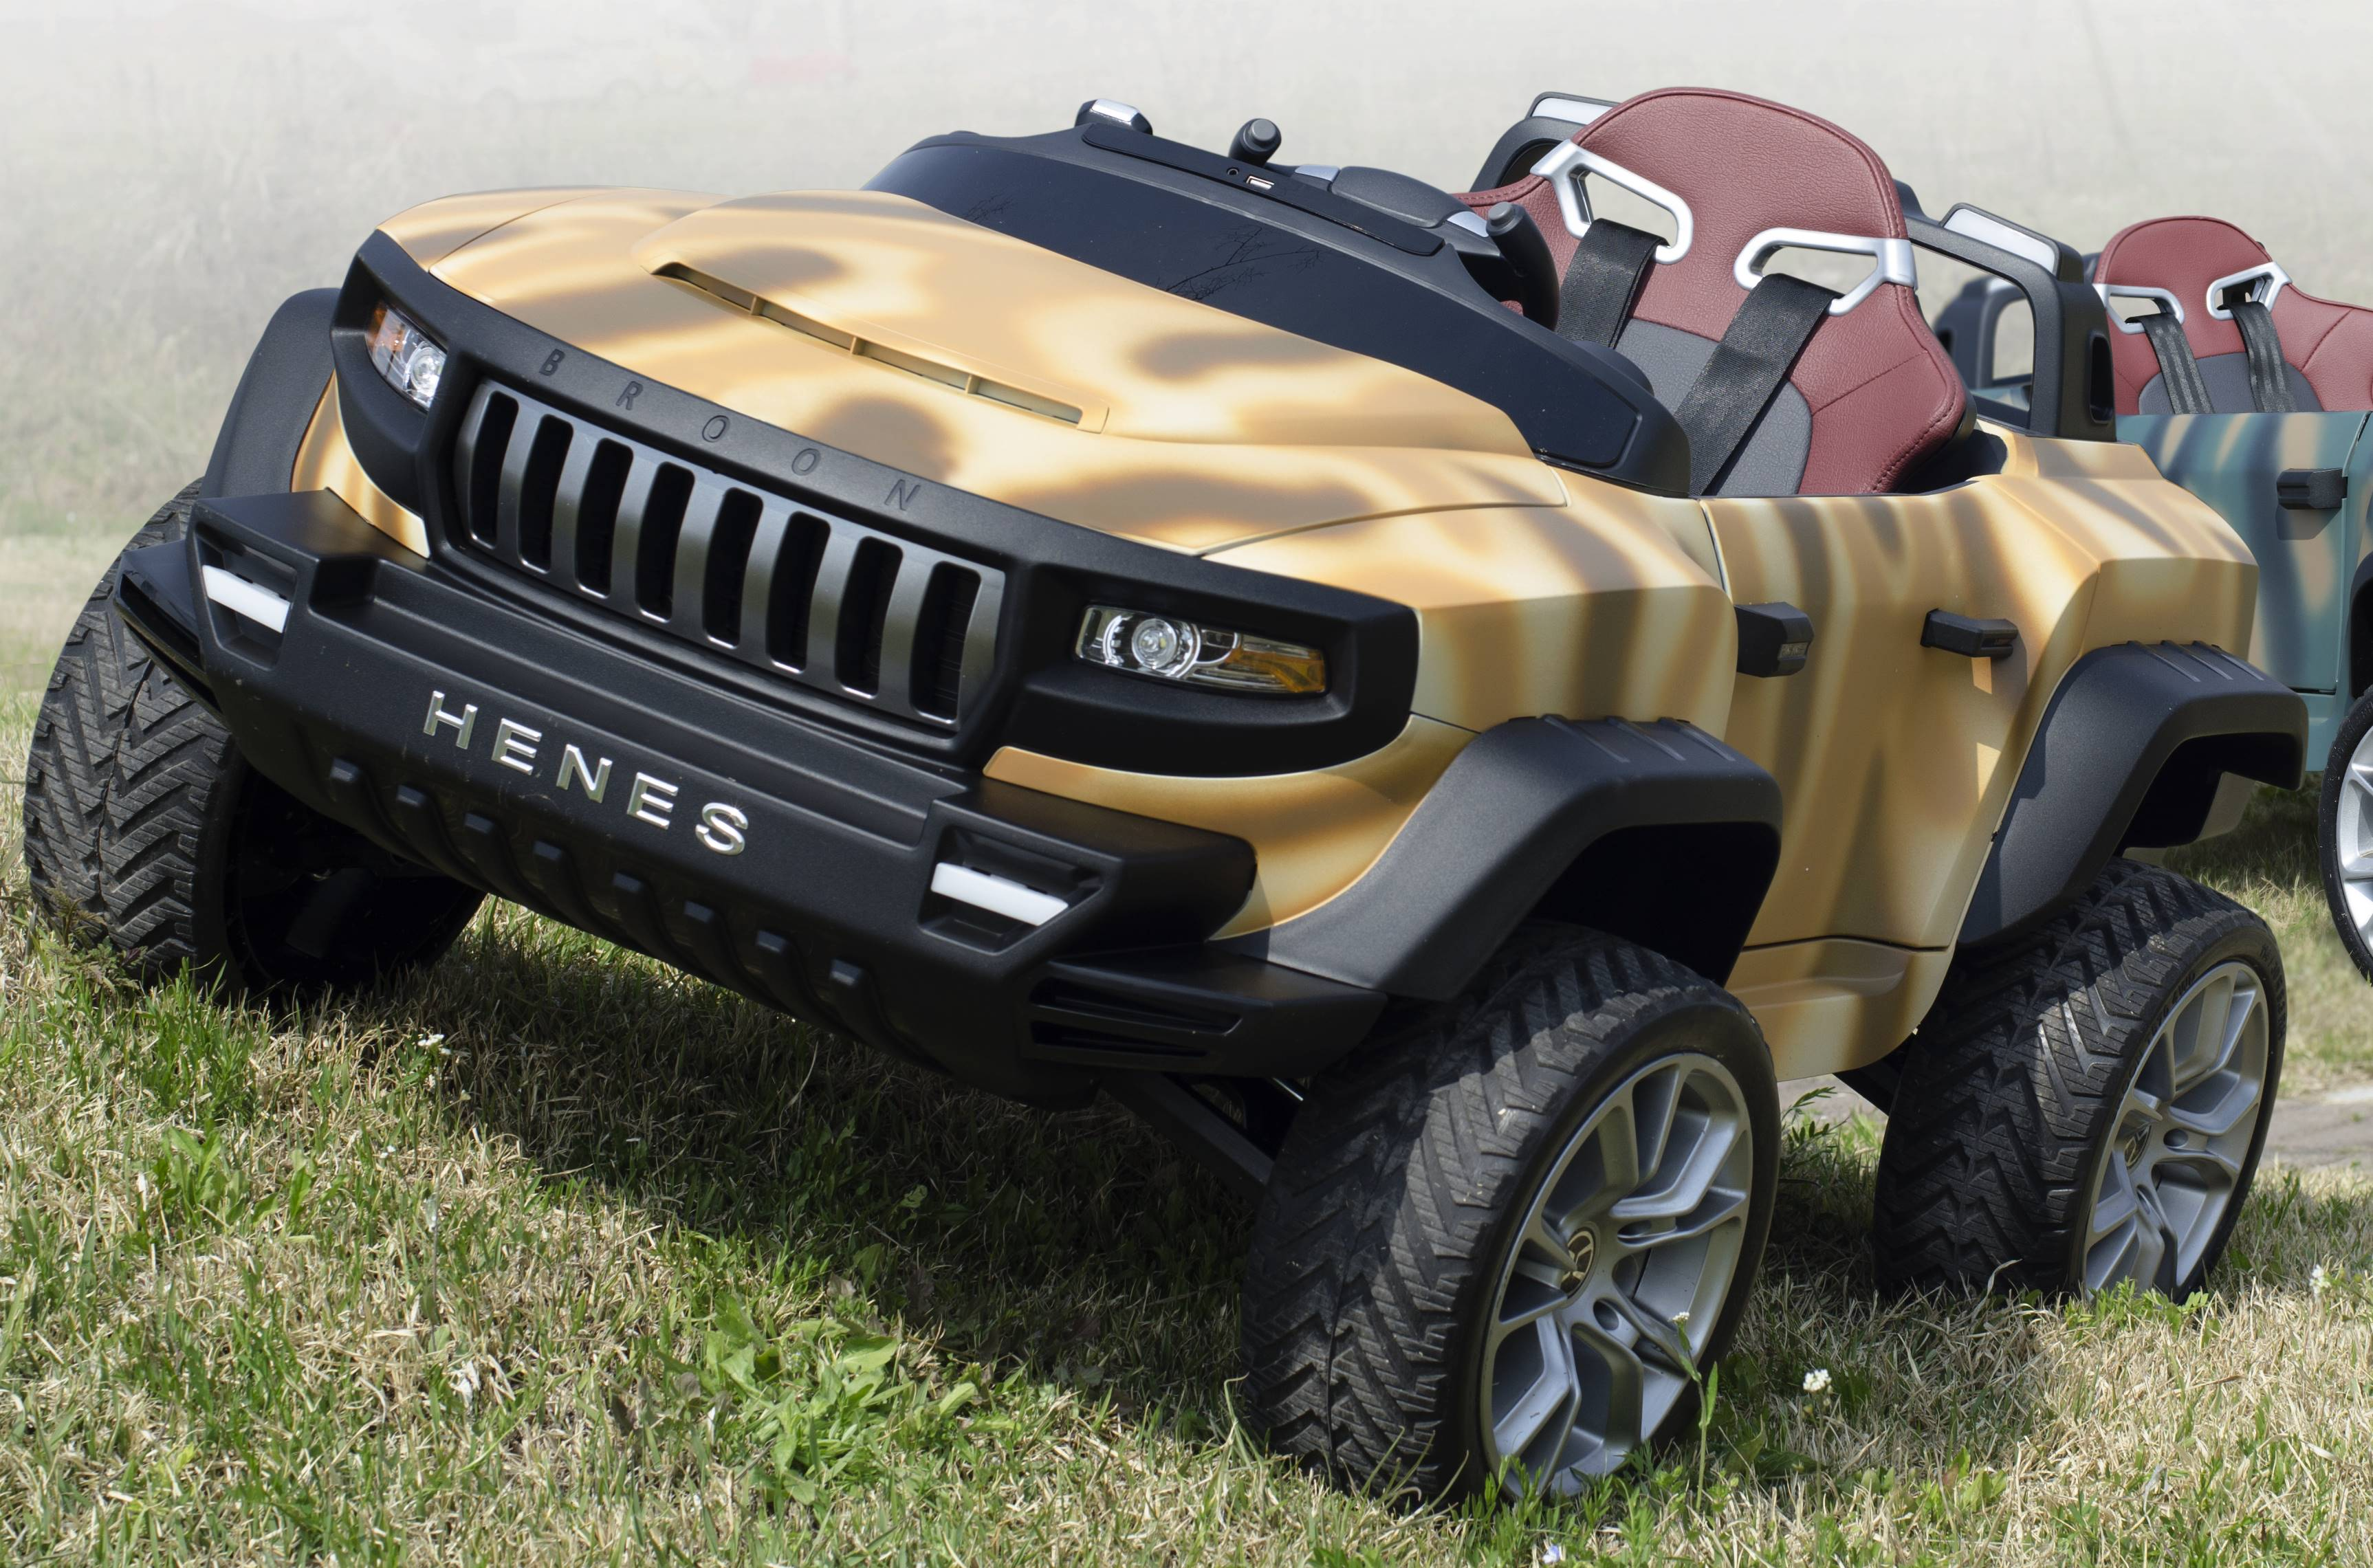 henes broon t870 army sand luxus kinder elektro auto allrad 4x4 24volt kinderauto online shop. Black Bedroom Furniture Sets. Home Design Ideas